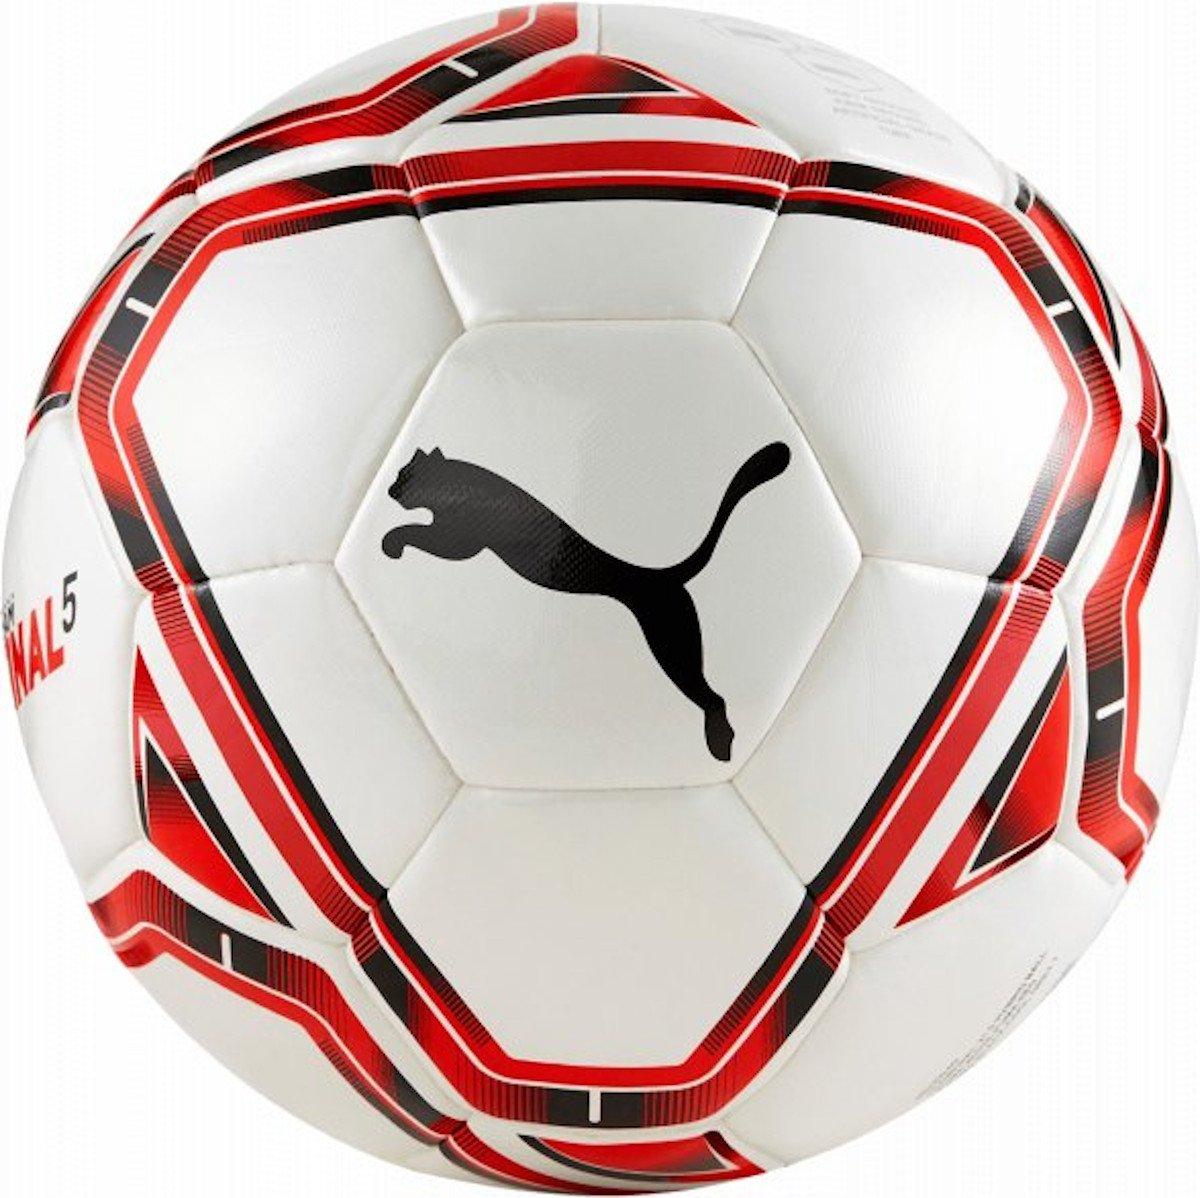 Lopta Puma teamFINAL 21.5. Hybrid Ball